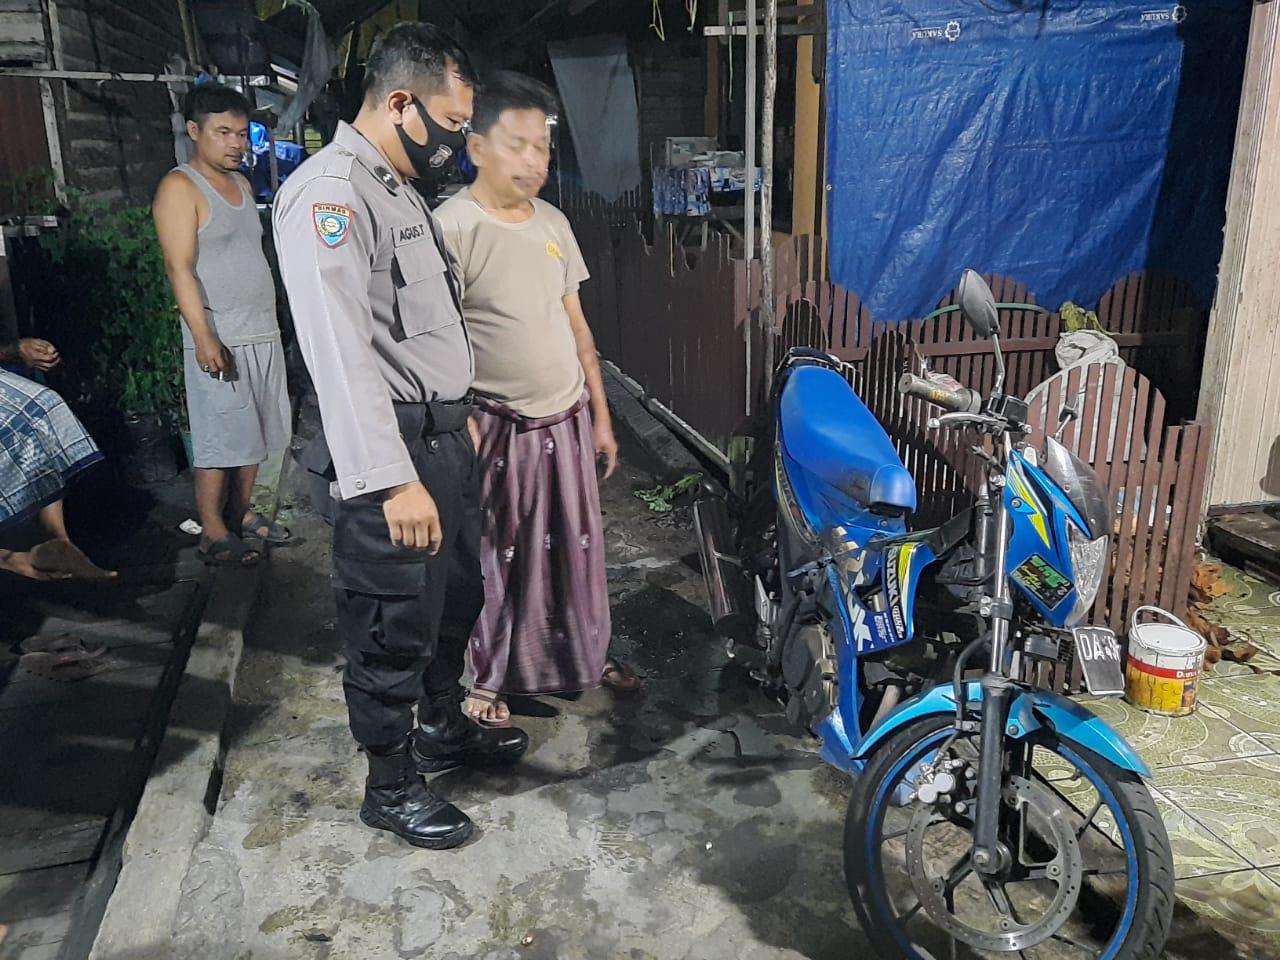 Polresta Palangka Raya Selidiki Kasus Pembakaran Sepeda Motor Di Murjani